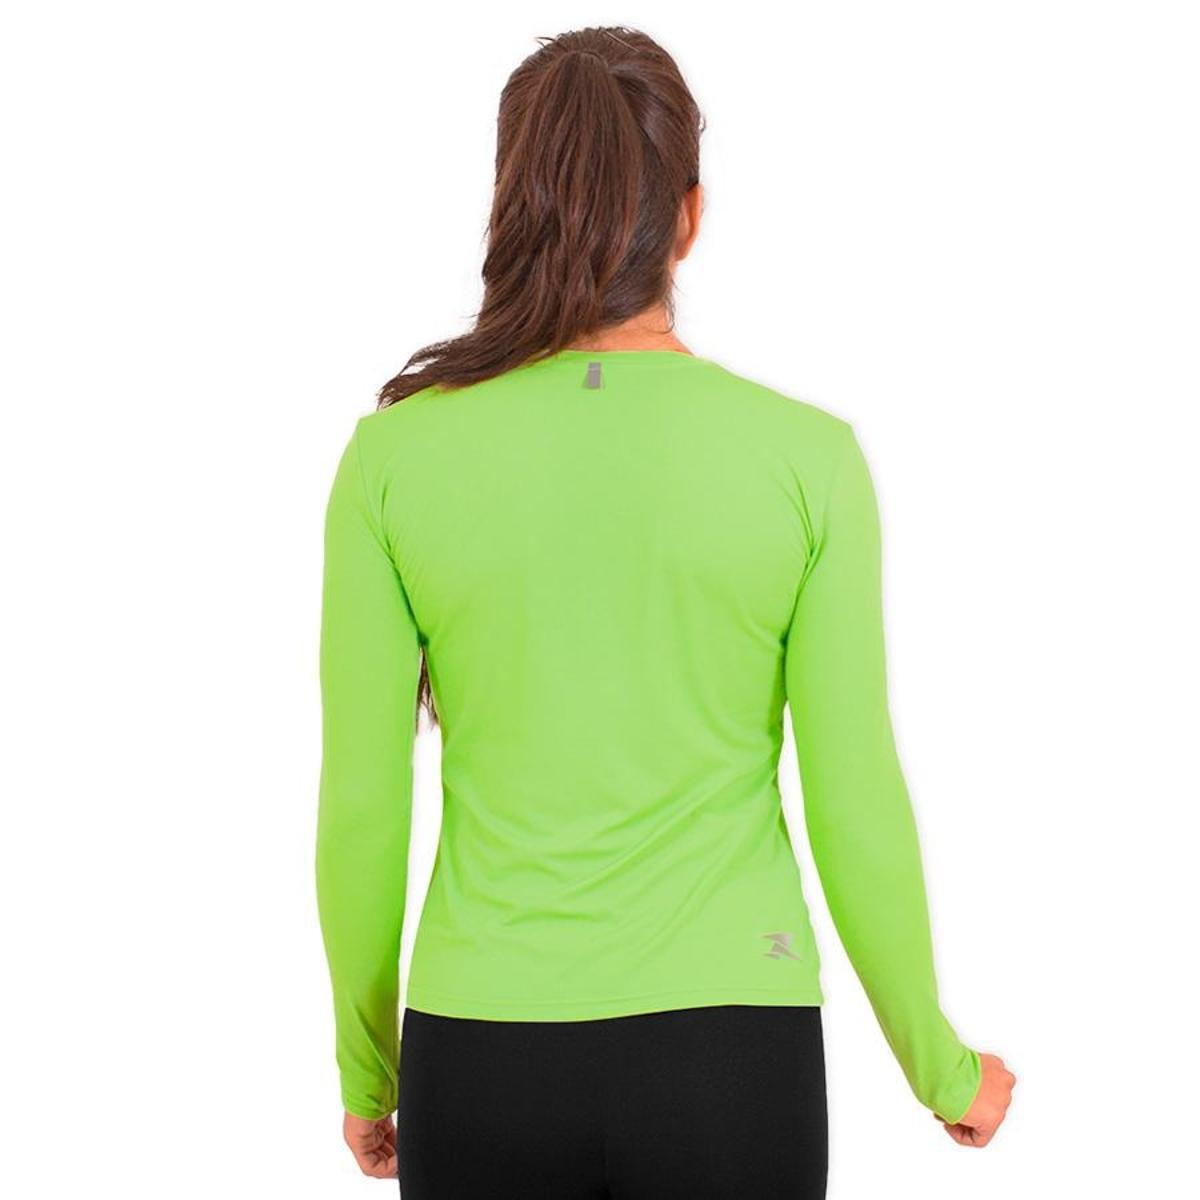 Poliamida LS HC Verde G1 UV50 CLR Performance Camisa 400 Running wSYPZZ